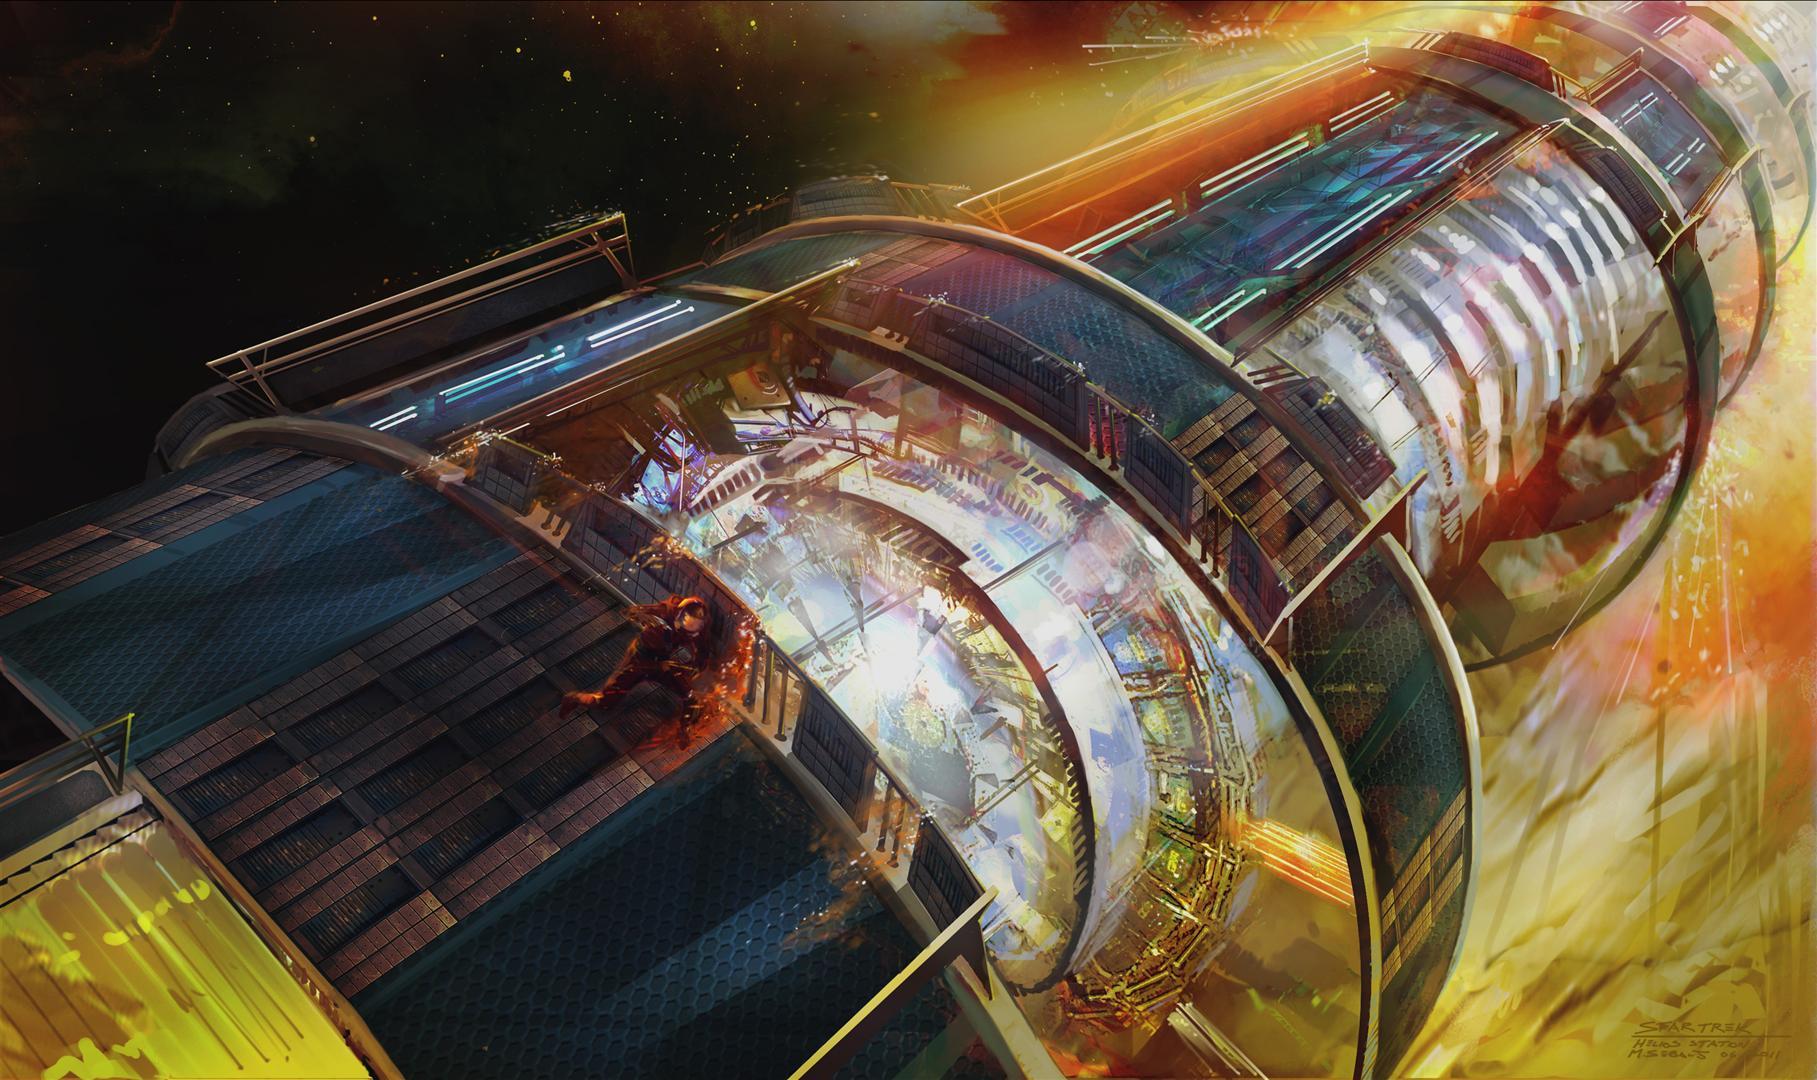 StarTrek_Concept Art 2 (Large)